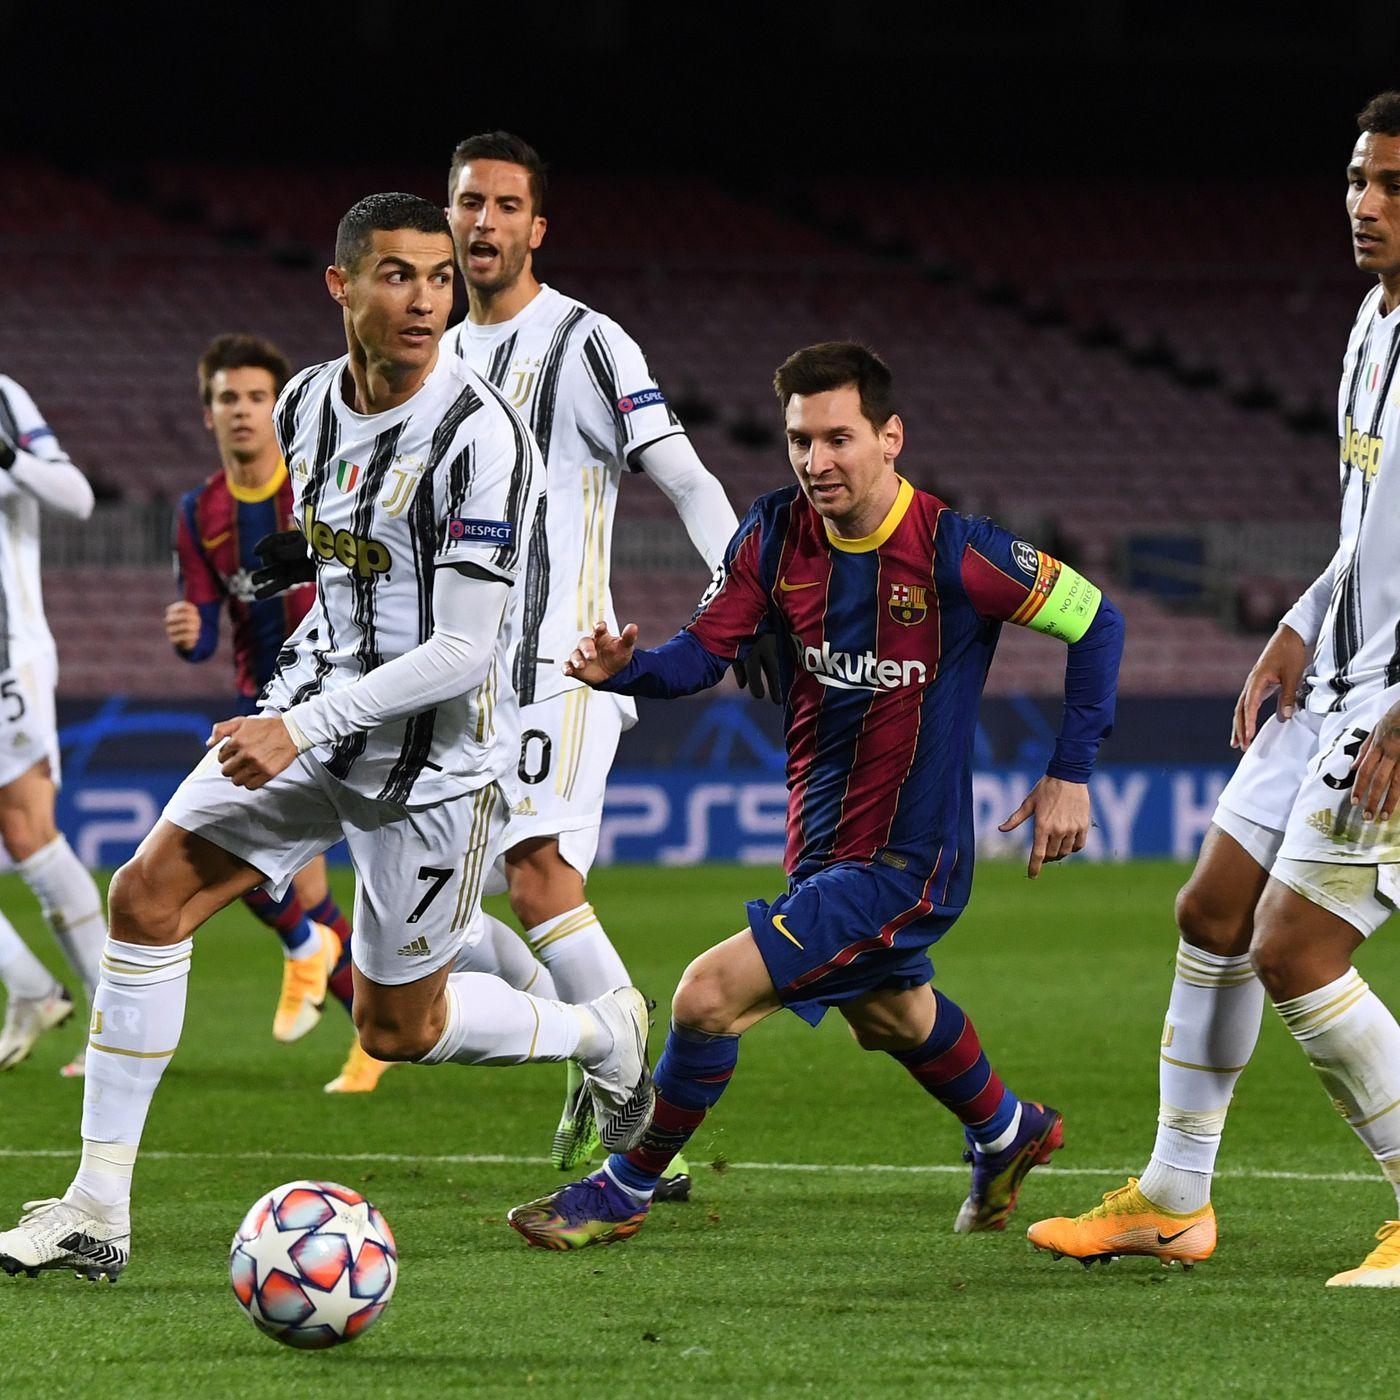 Barcelona Vs Juventus Champions League Final Score 0 3 Pathetic Barca Embarrassed At Home Lose Group G Barca Blaugranes